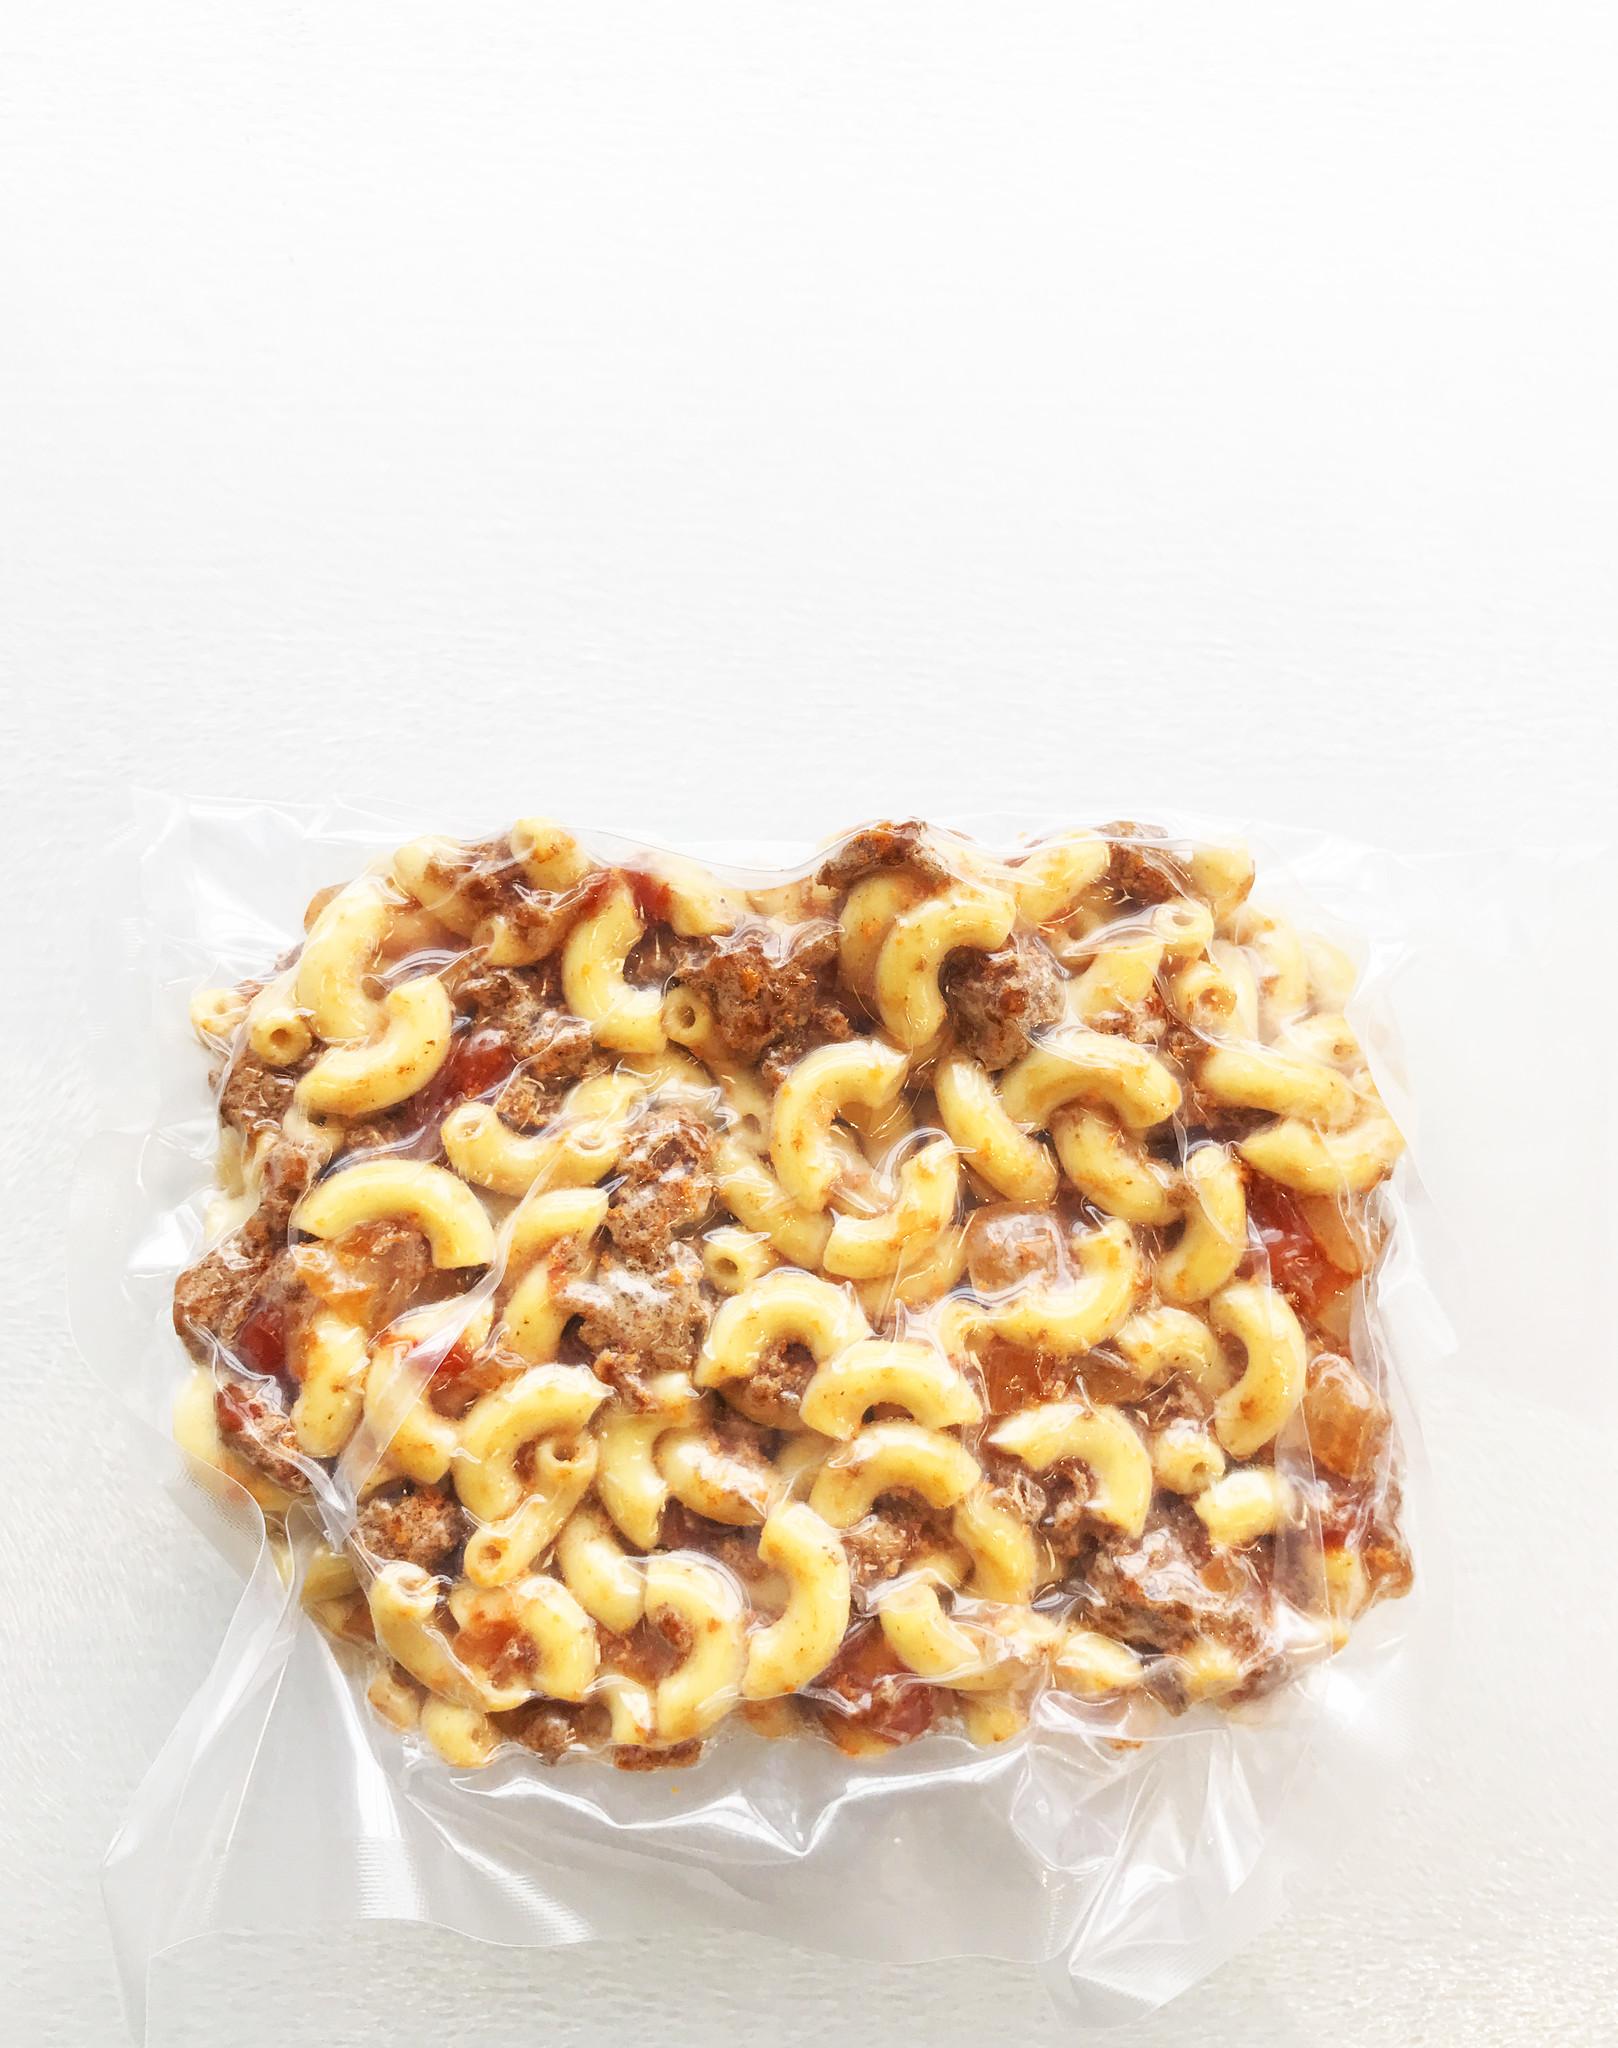 Macaroni with meat sauce (325g)